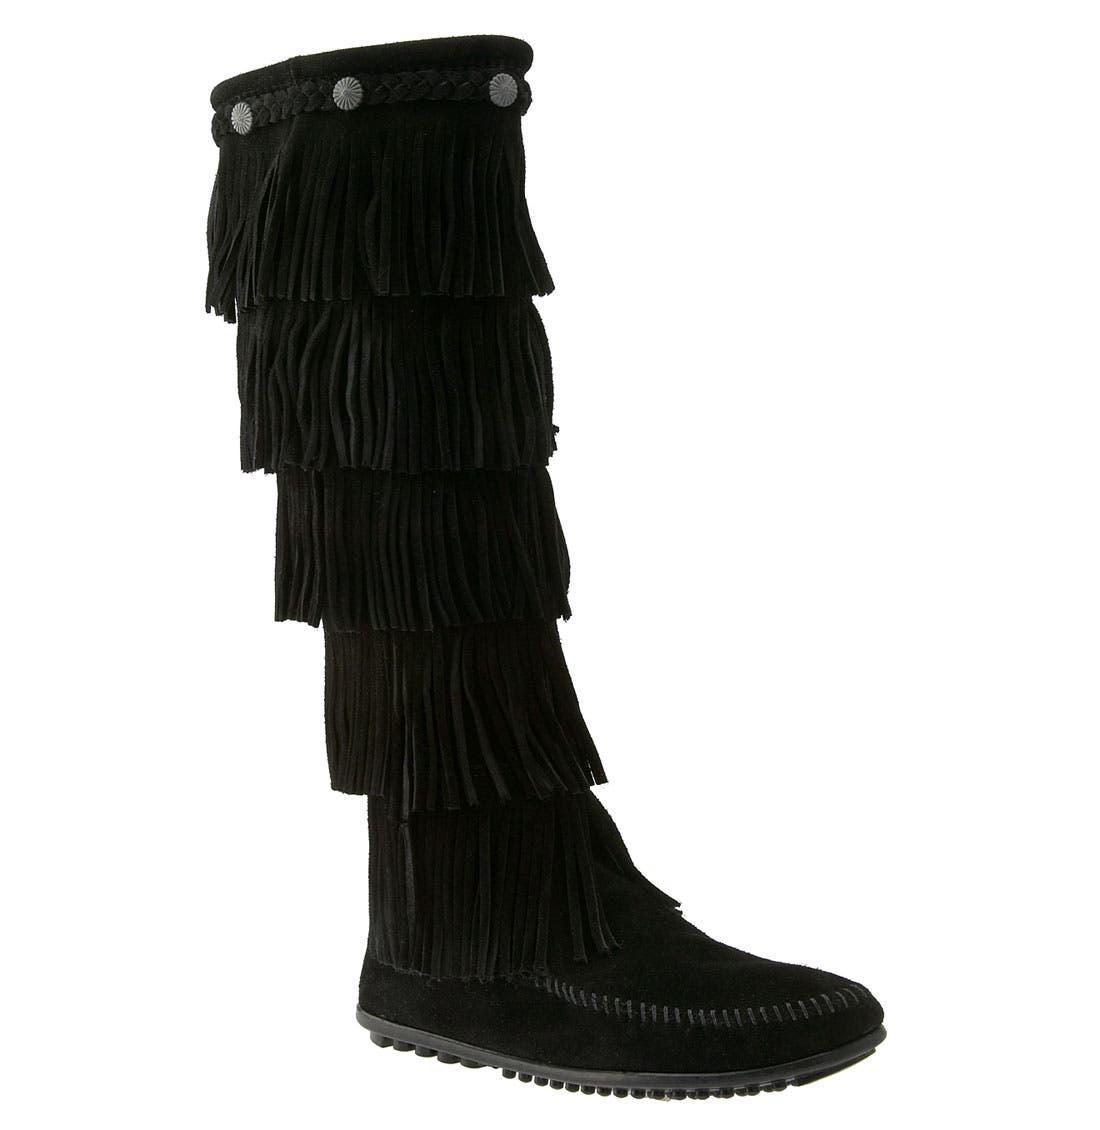 Minnetonka '5 Layer Fringe' Boot